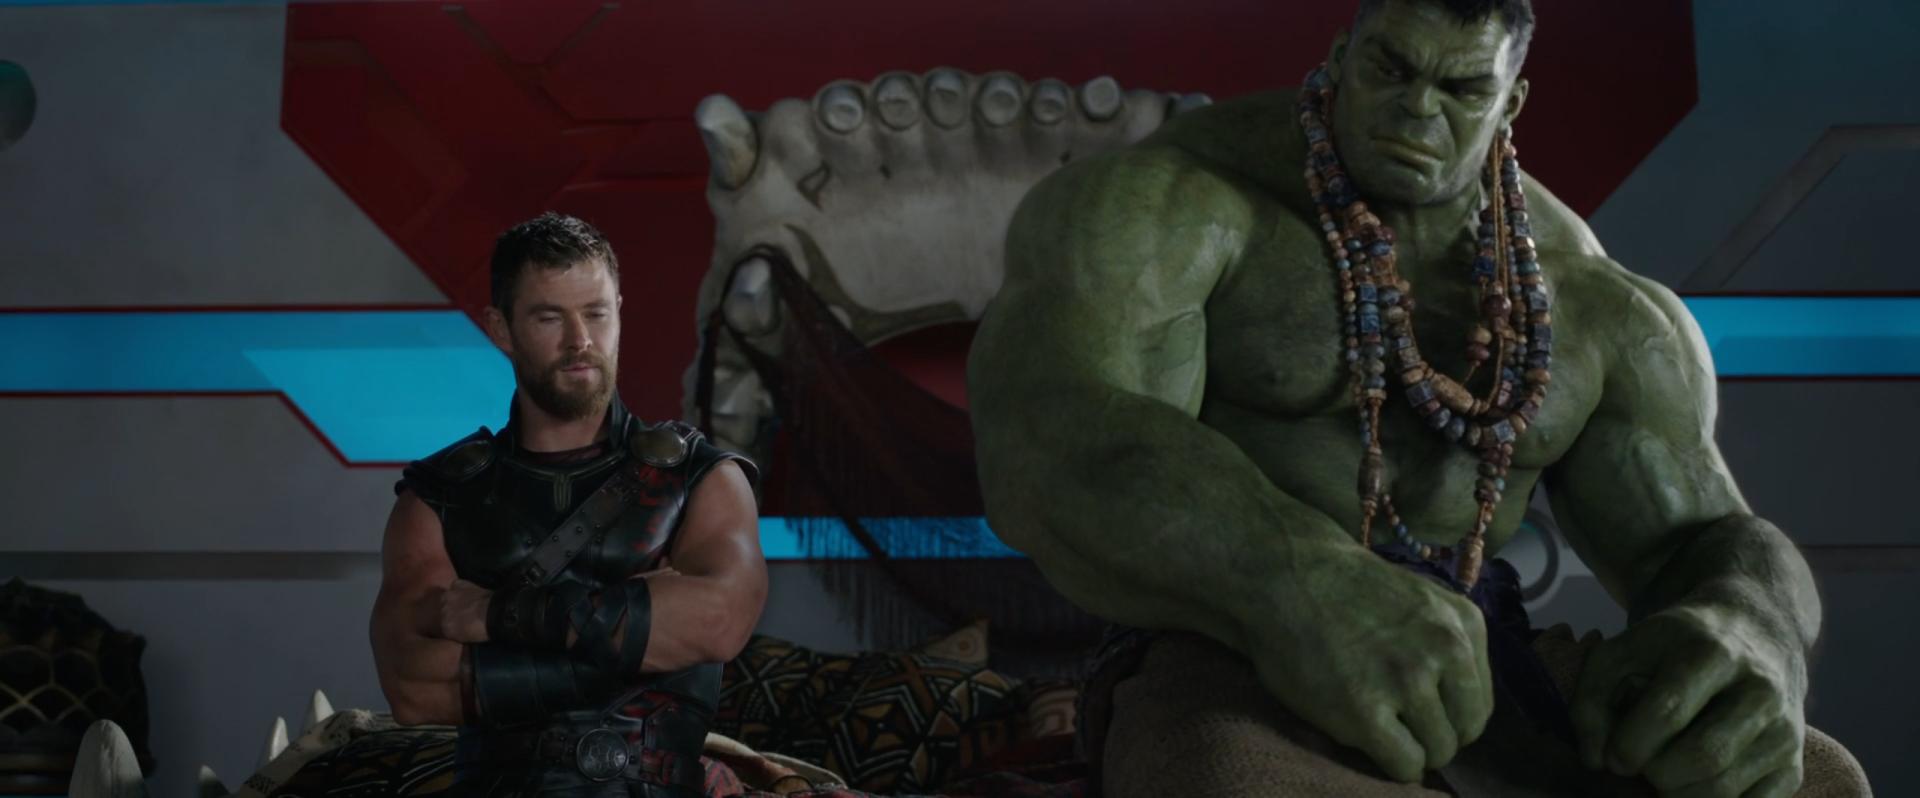 Movie - Thor: Ragnarok  Hulk Thor Wallpaper